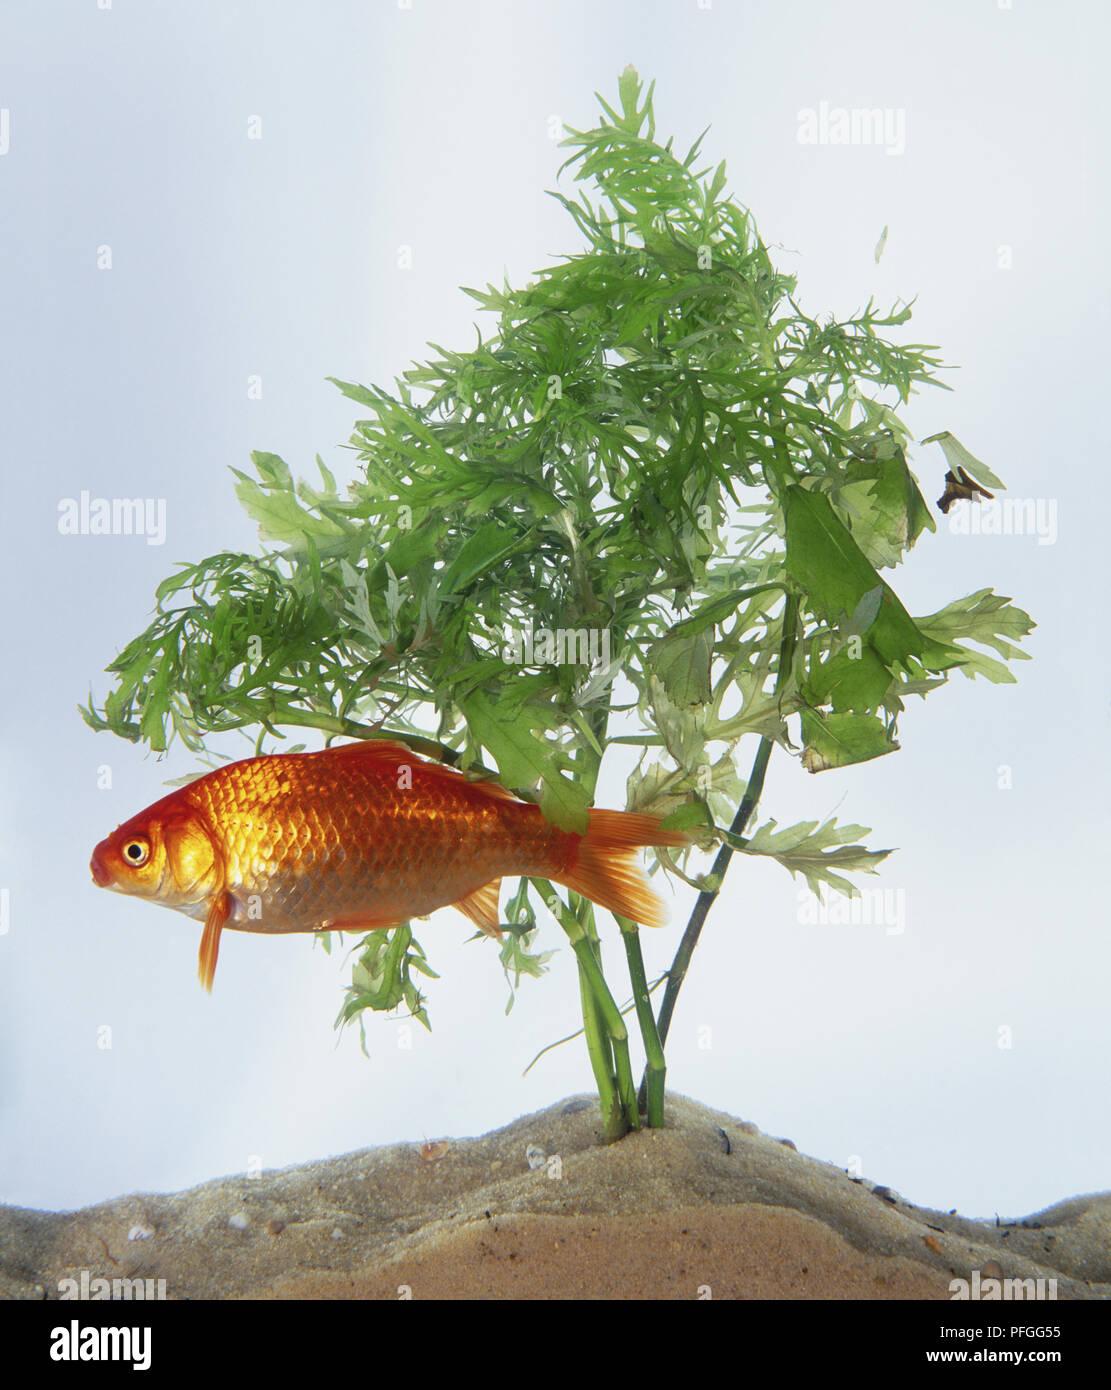 Goldfish (Carassius auratus) swimming in aquarium by green underwater plant, side view Stock Photo